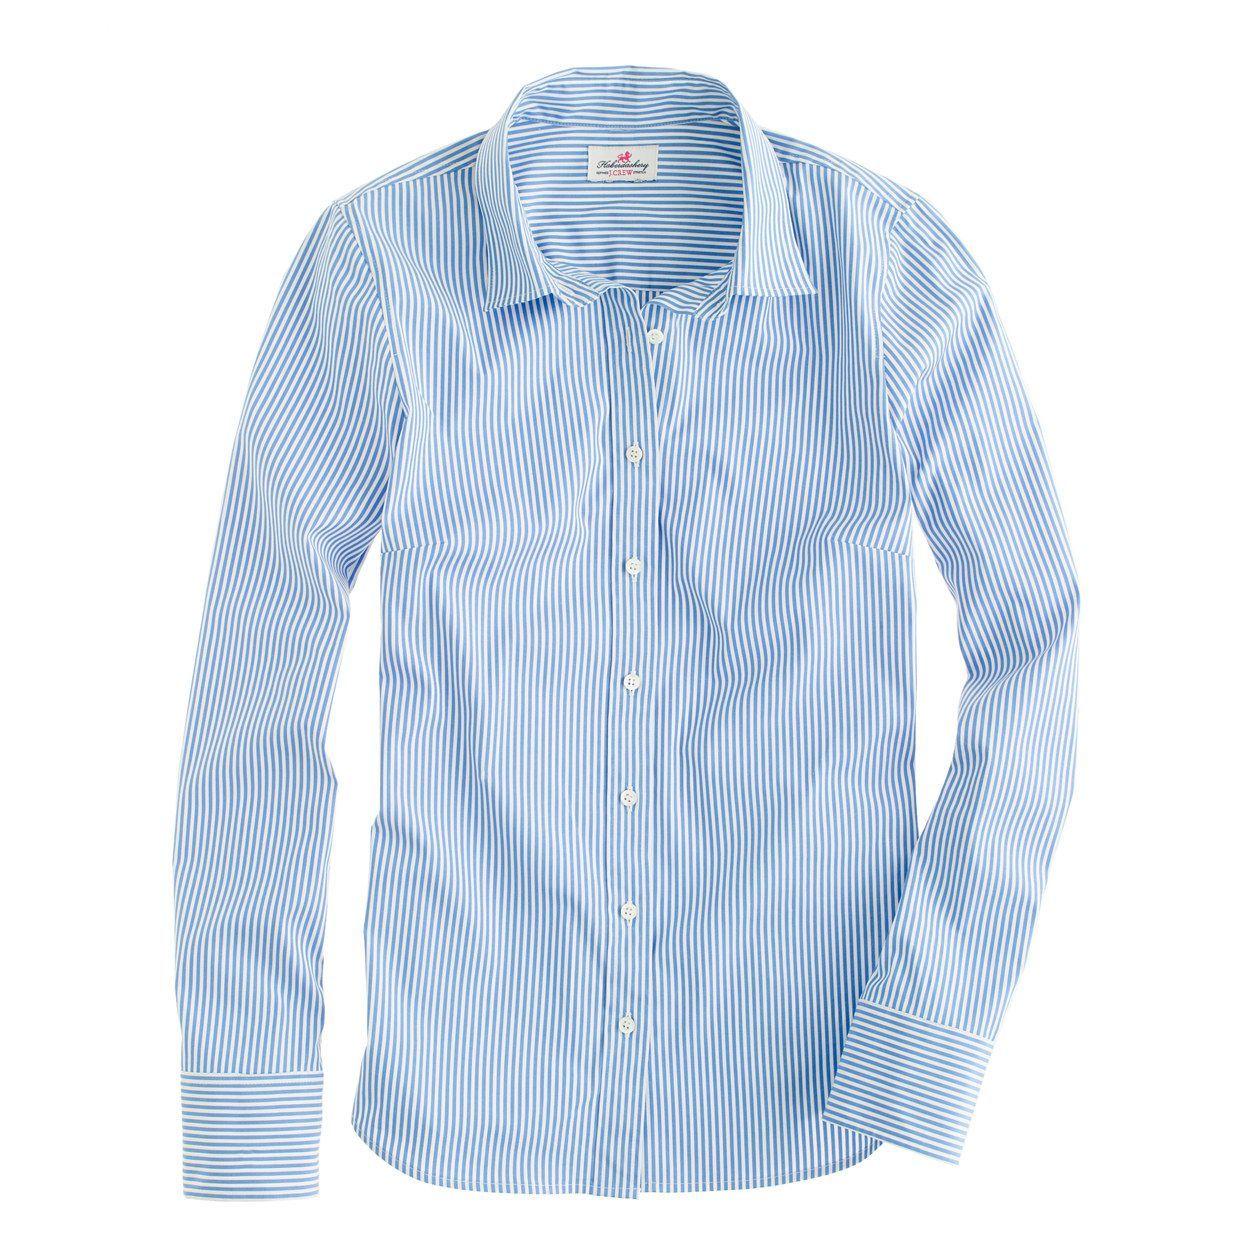 Jcrew womens petite stretch perfect shirt in classic stripe size m